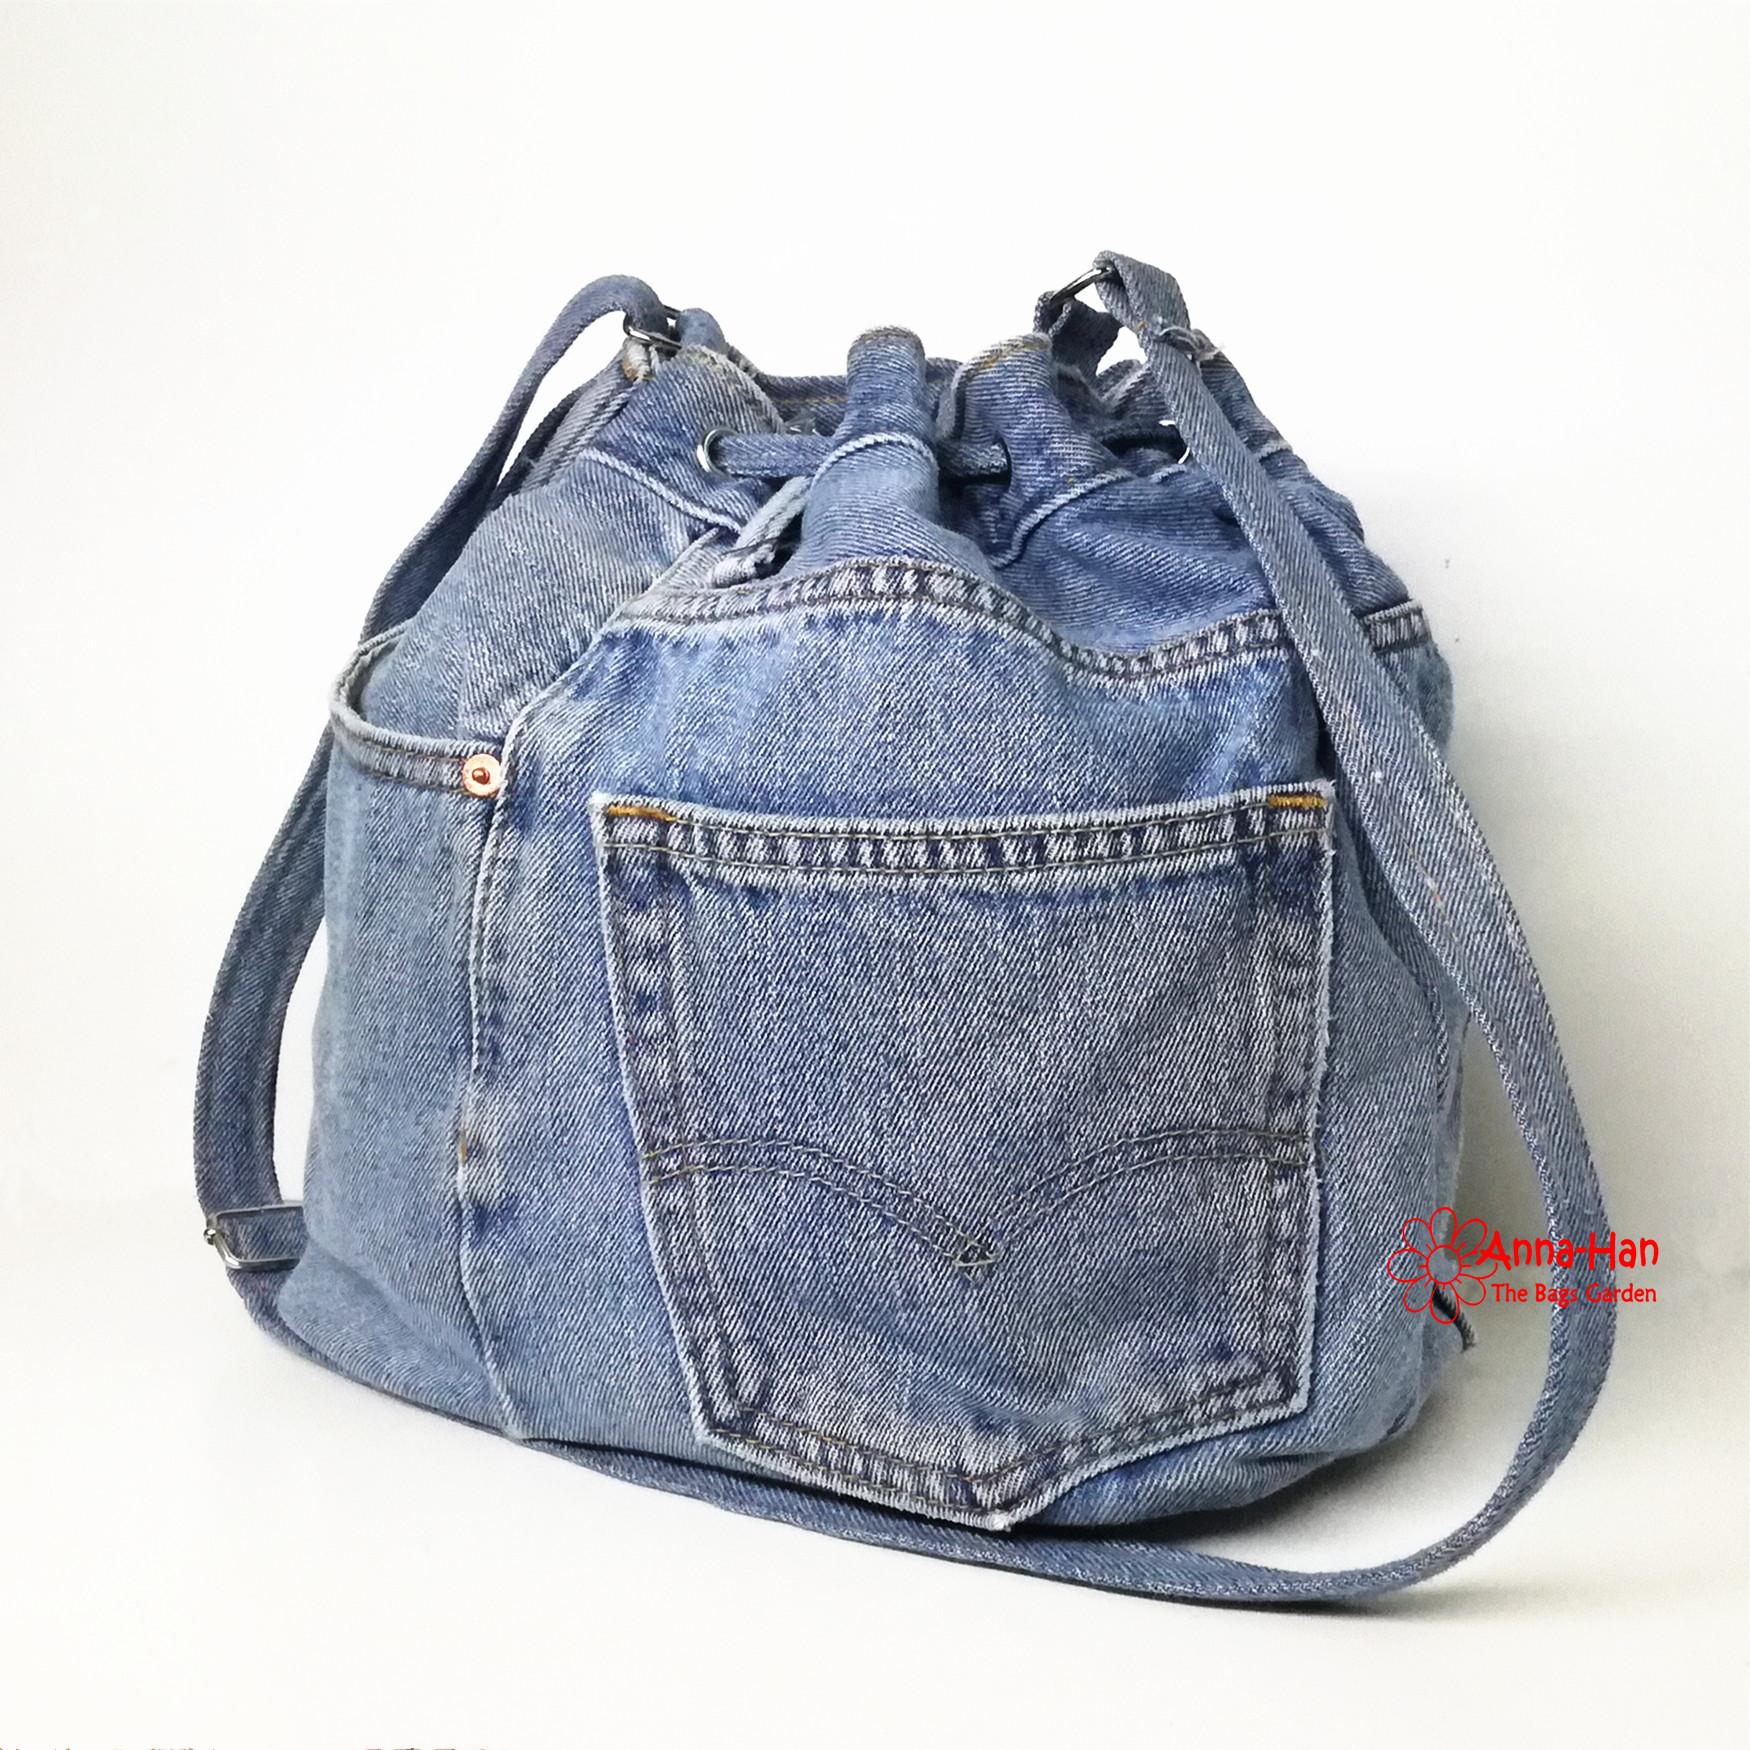 Jb11 Handmade Jean Bucket Bag The Bags Garden